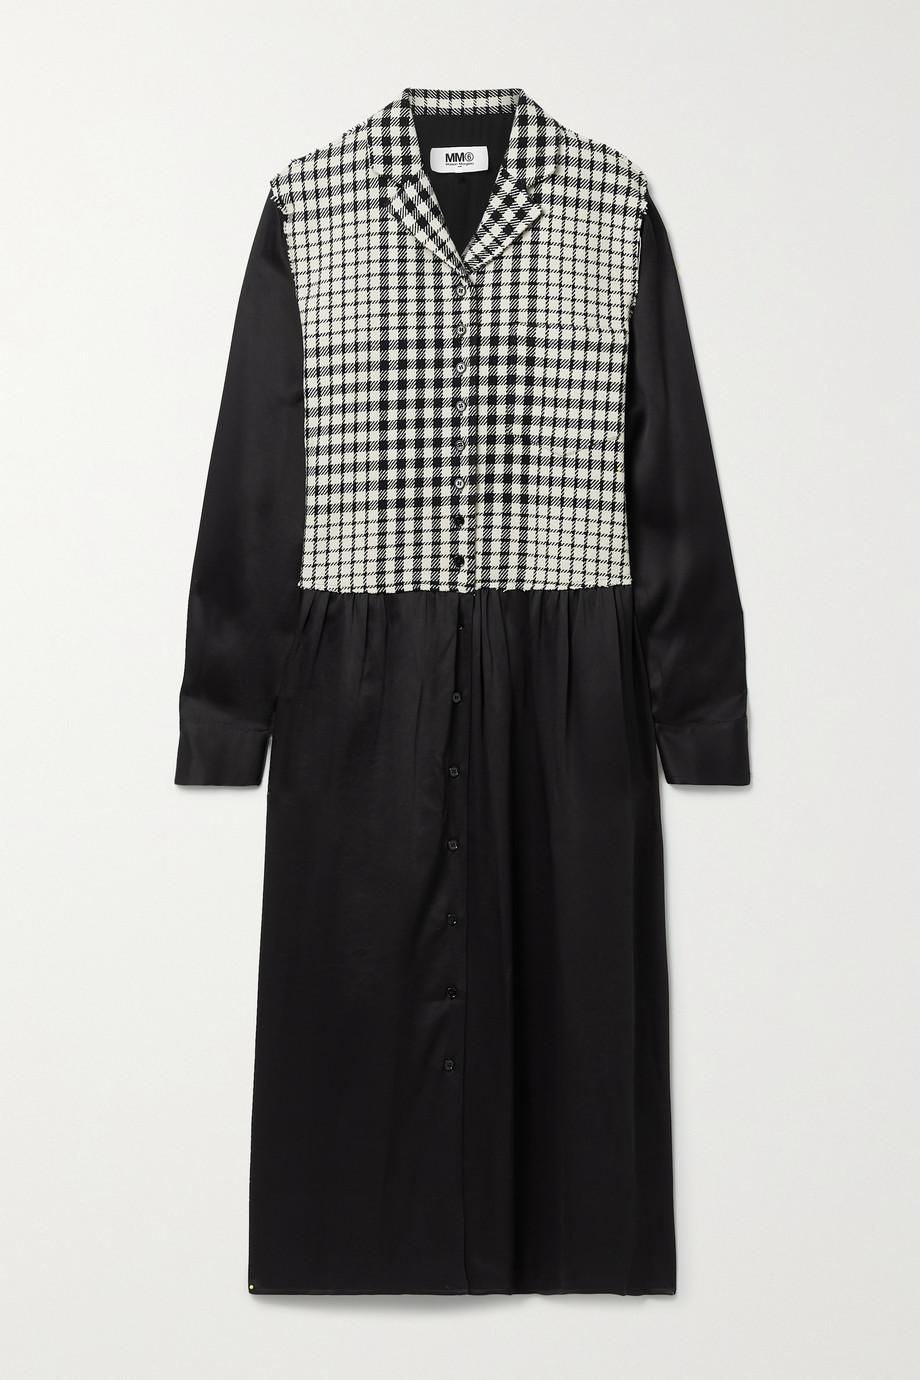 MM6 Maison Margiela Paneled checked wool-blend and satin midi dress